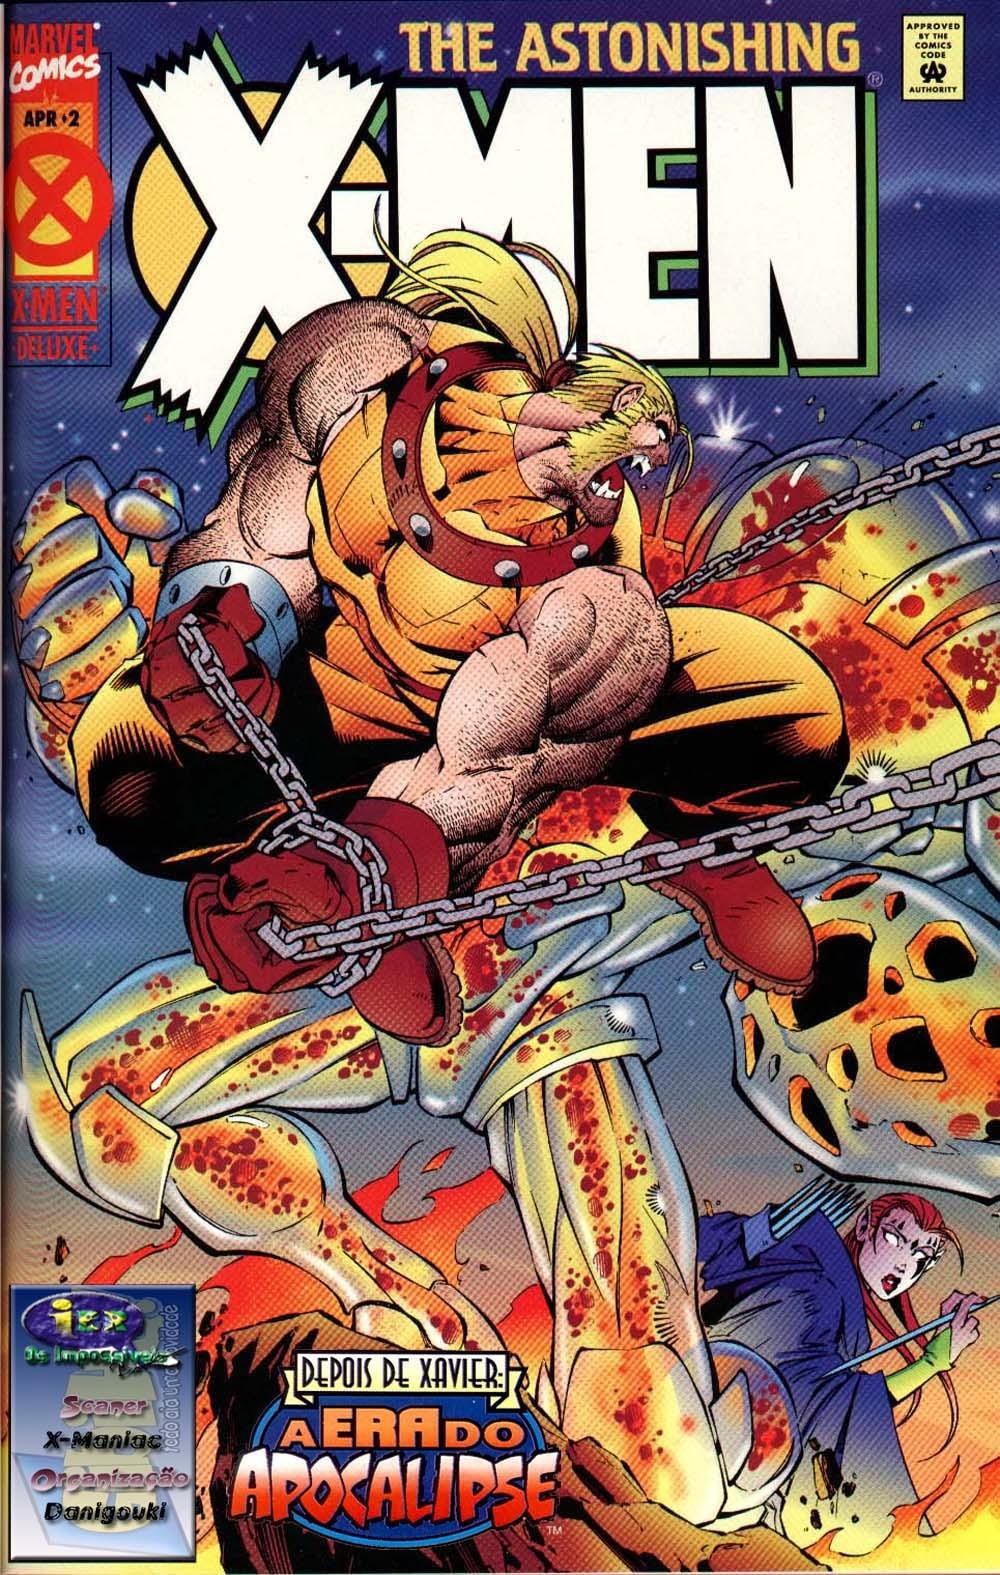 X-Men - A Era do Apocalipse #25